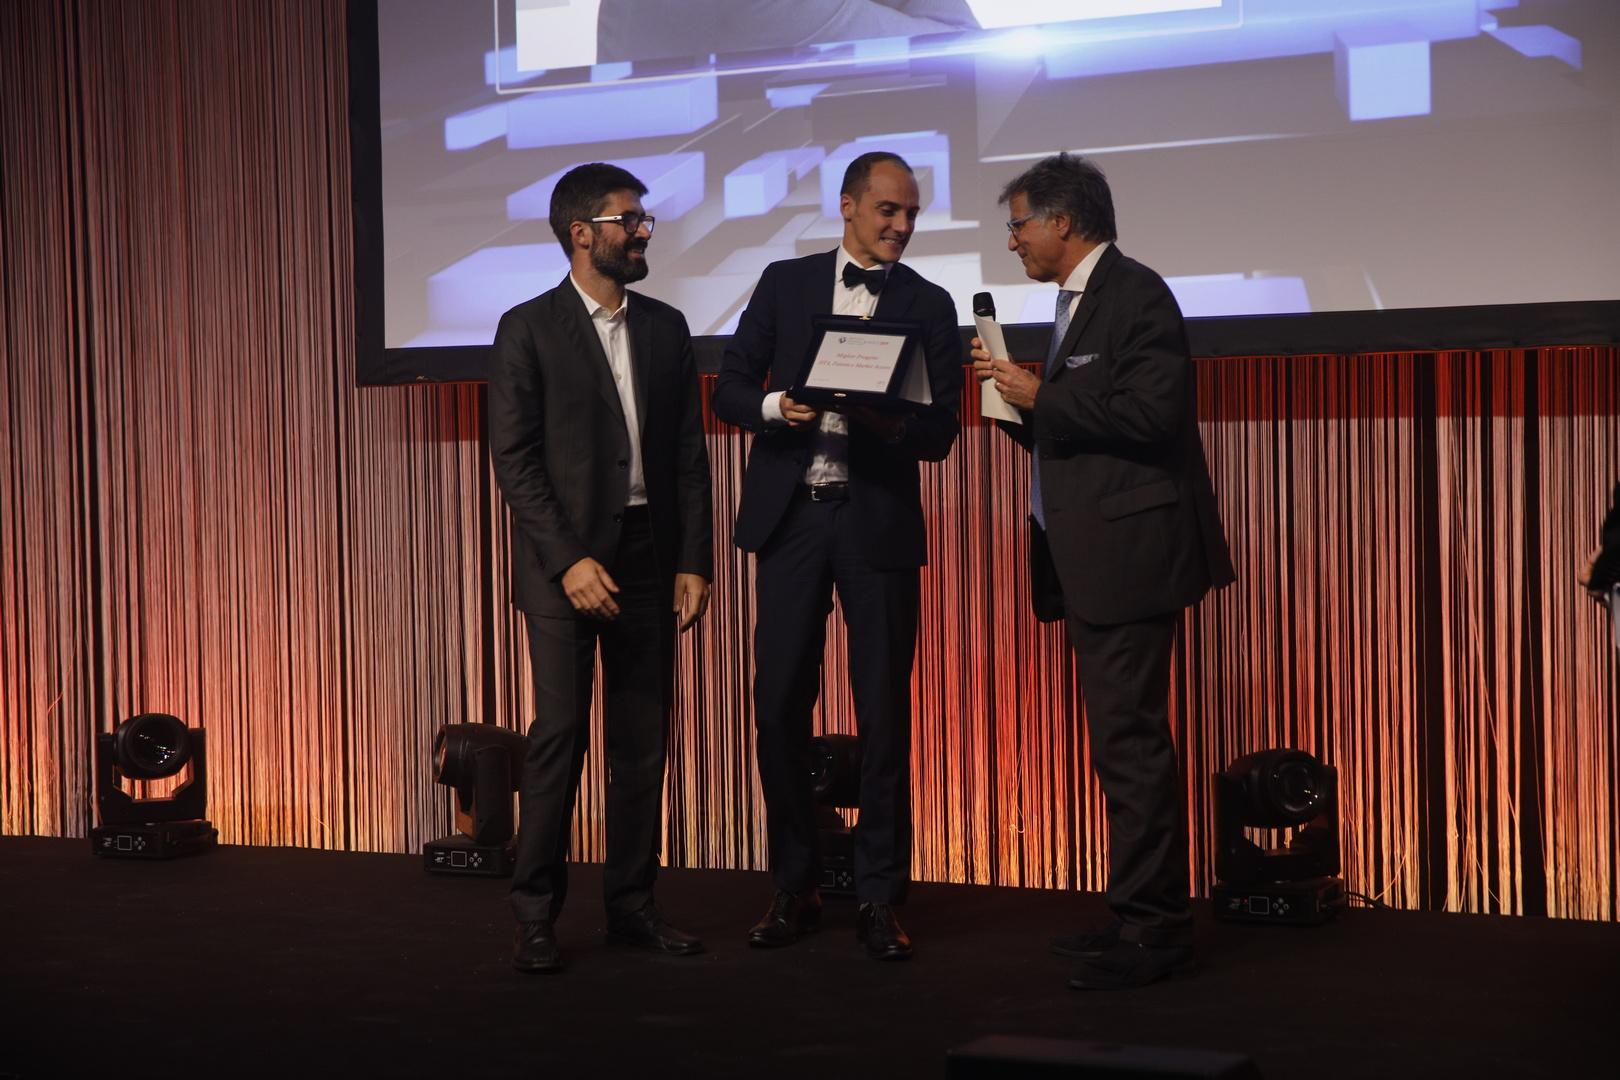 AboutPharma Digital Awards 2019 (81)